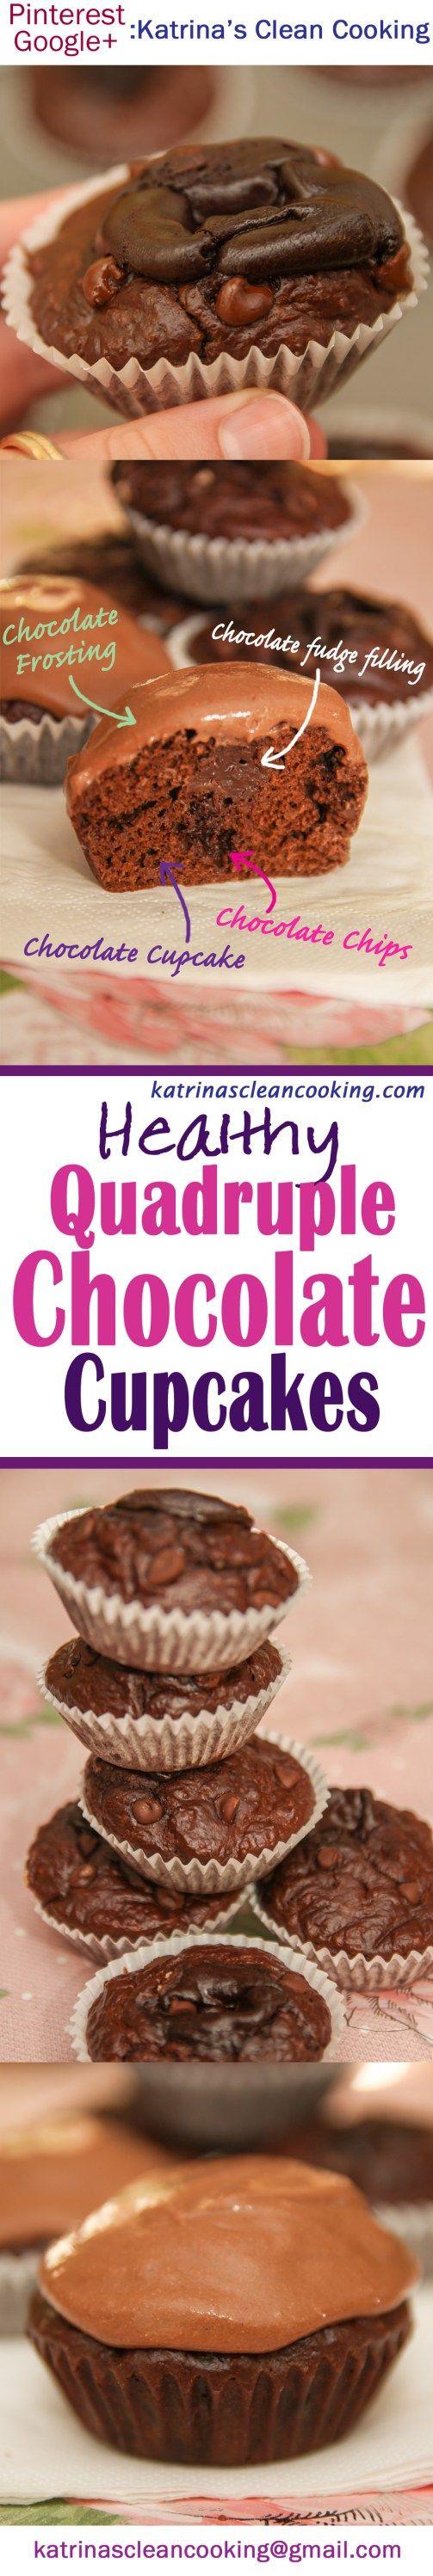 Gluten-free, refined-sugar-free Healthy Quadruple Chocolate Cupcakes #healthy #chocolatecupcakes #sugarfree